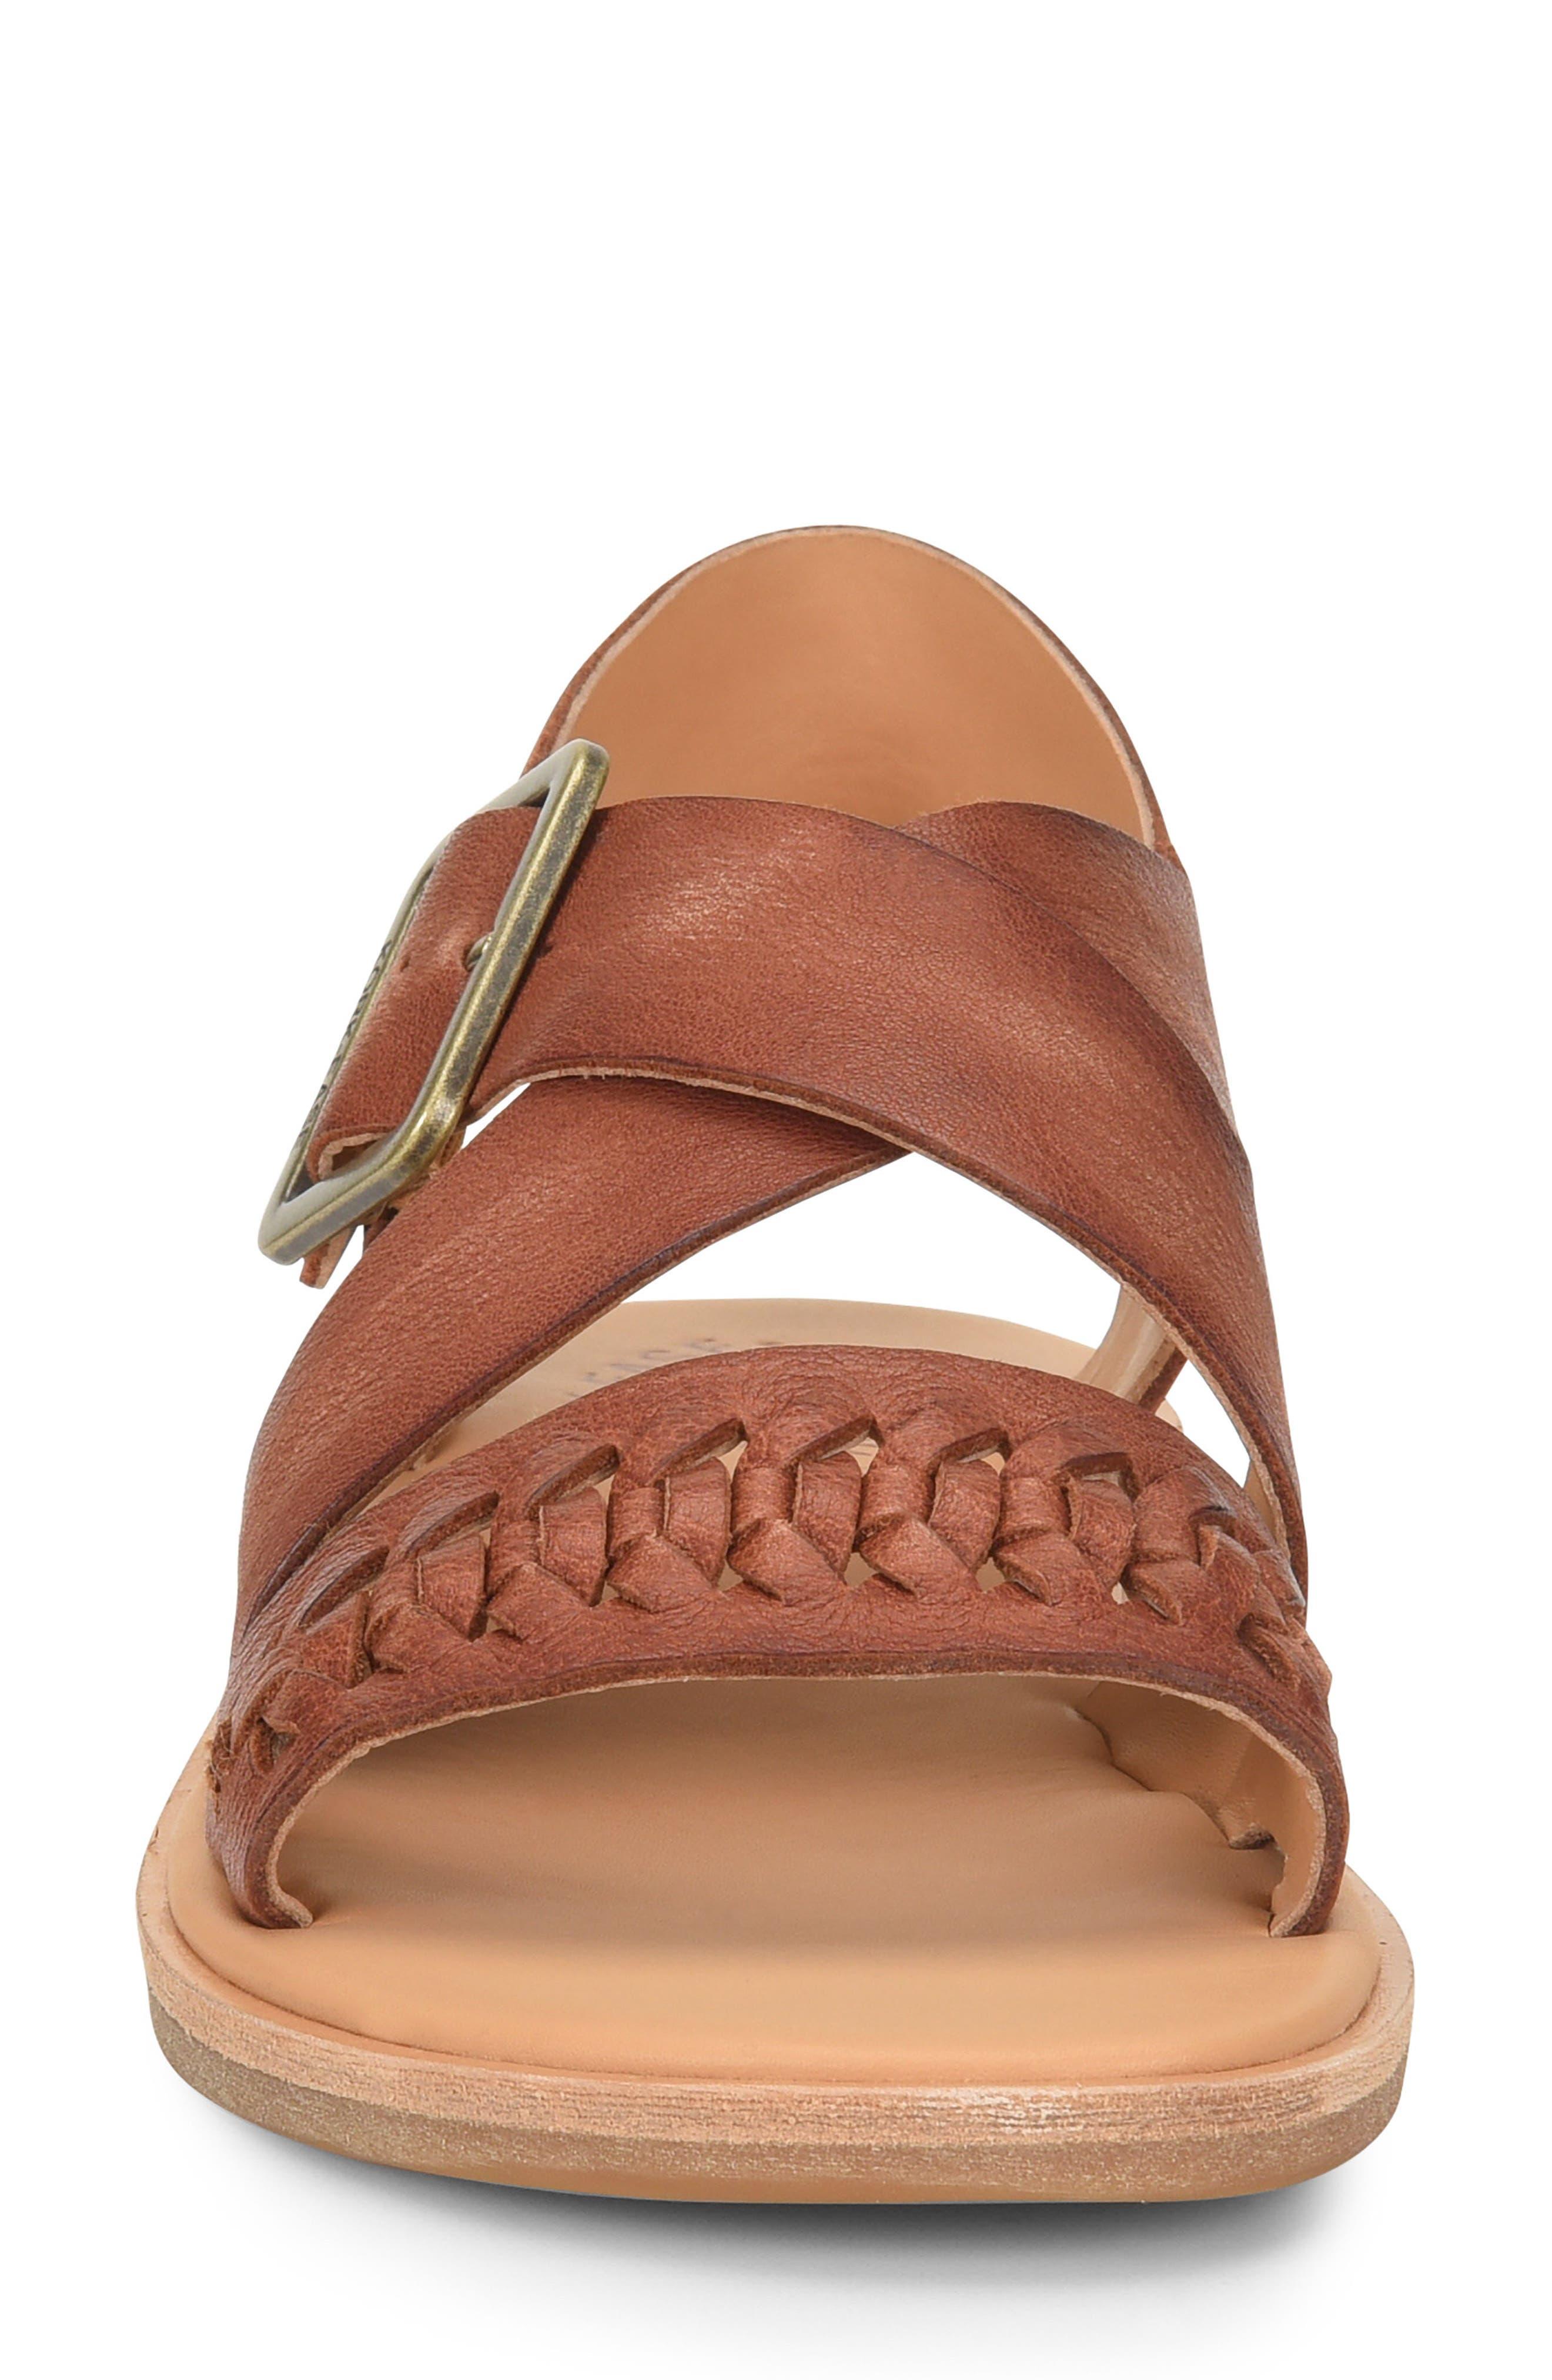 Nara Braid Sandal,                             Alternate thumbnail 4, color,                             BROWN LEATHER